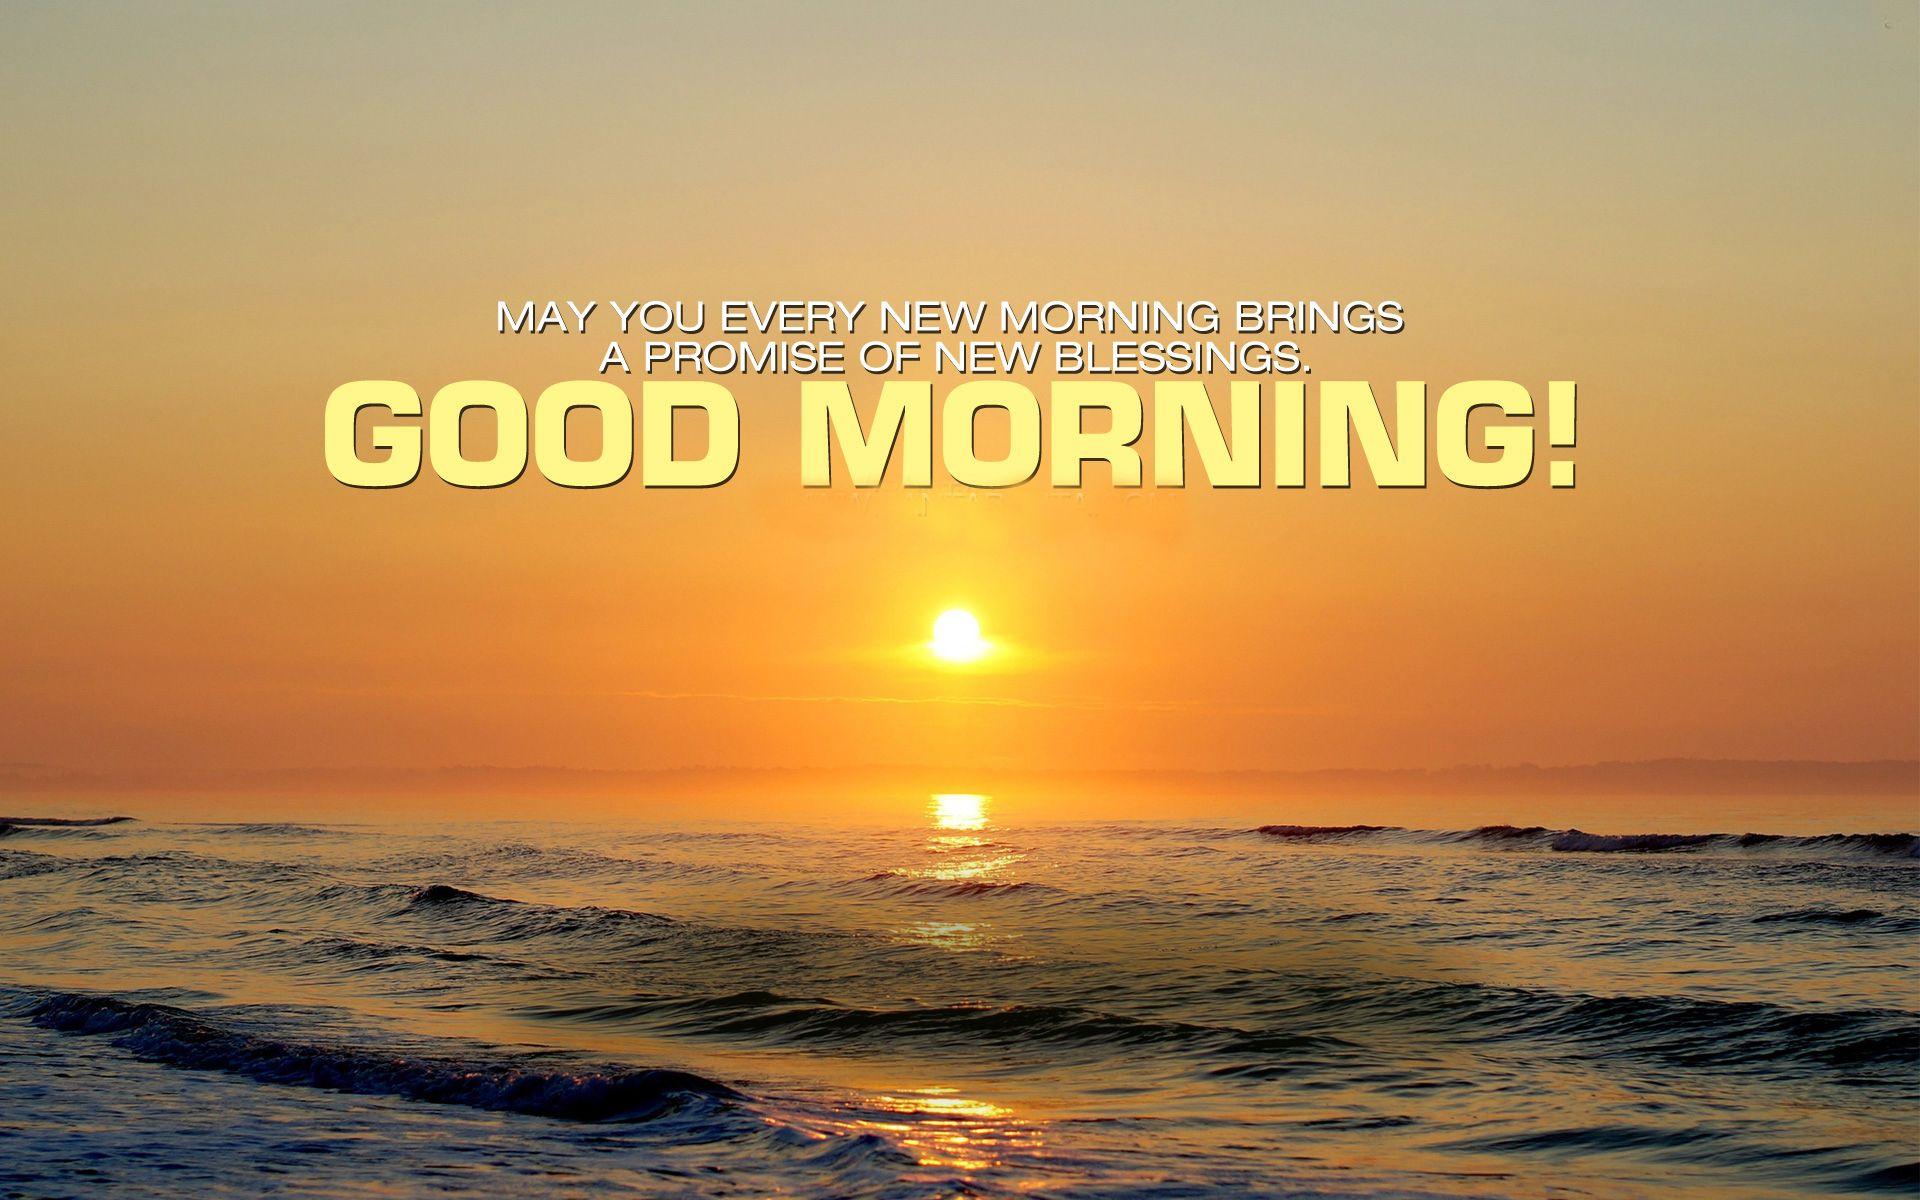 Wallpaper download good morning - Good Morning Wishes Hd Wallpaper Good Morning Wishes Hd Wallpaper Download Good Morning Wishes Hd Wallpapers